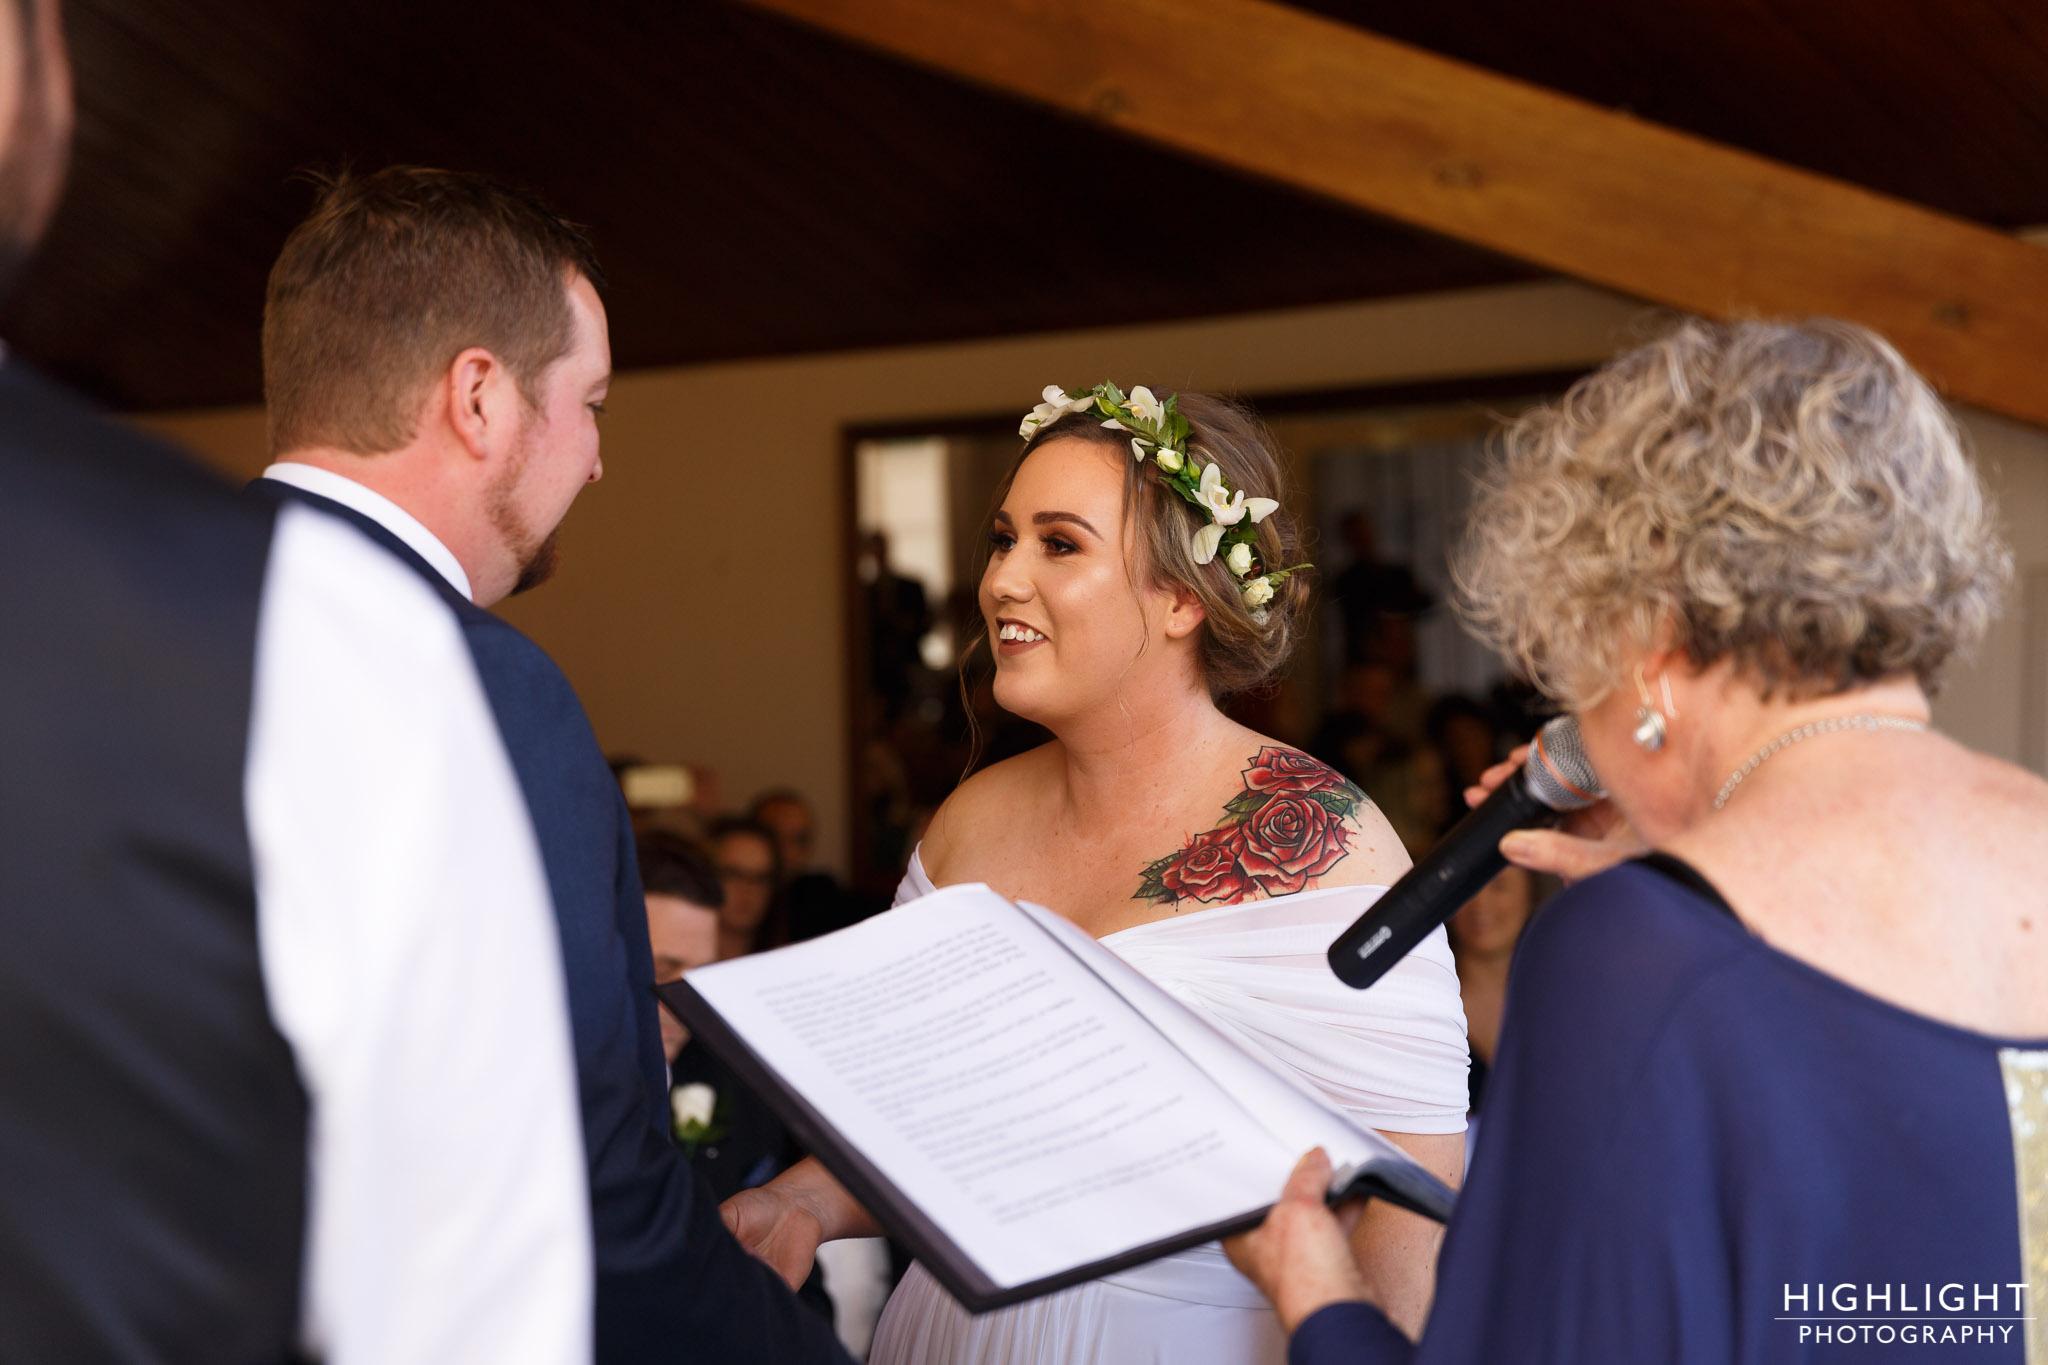 Highlight-wedding-photography-new-zealand-palmerston-north-53.jpg